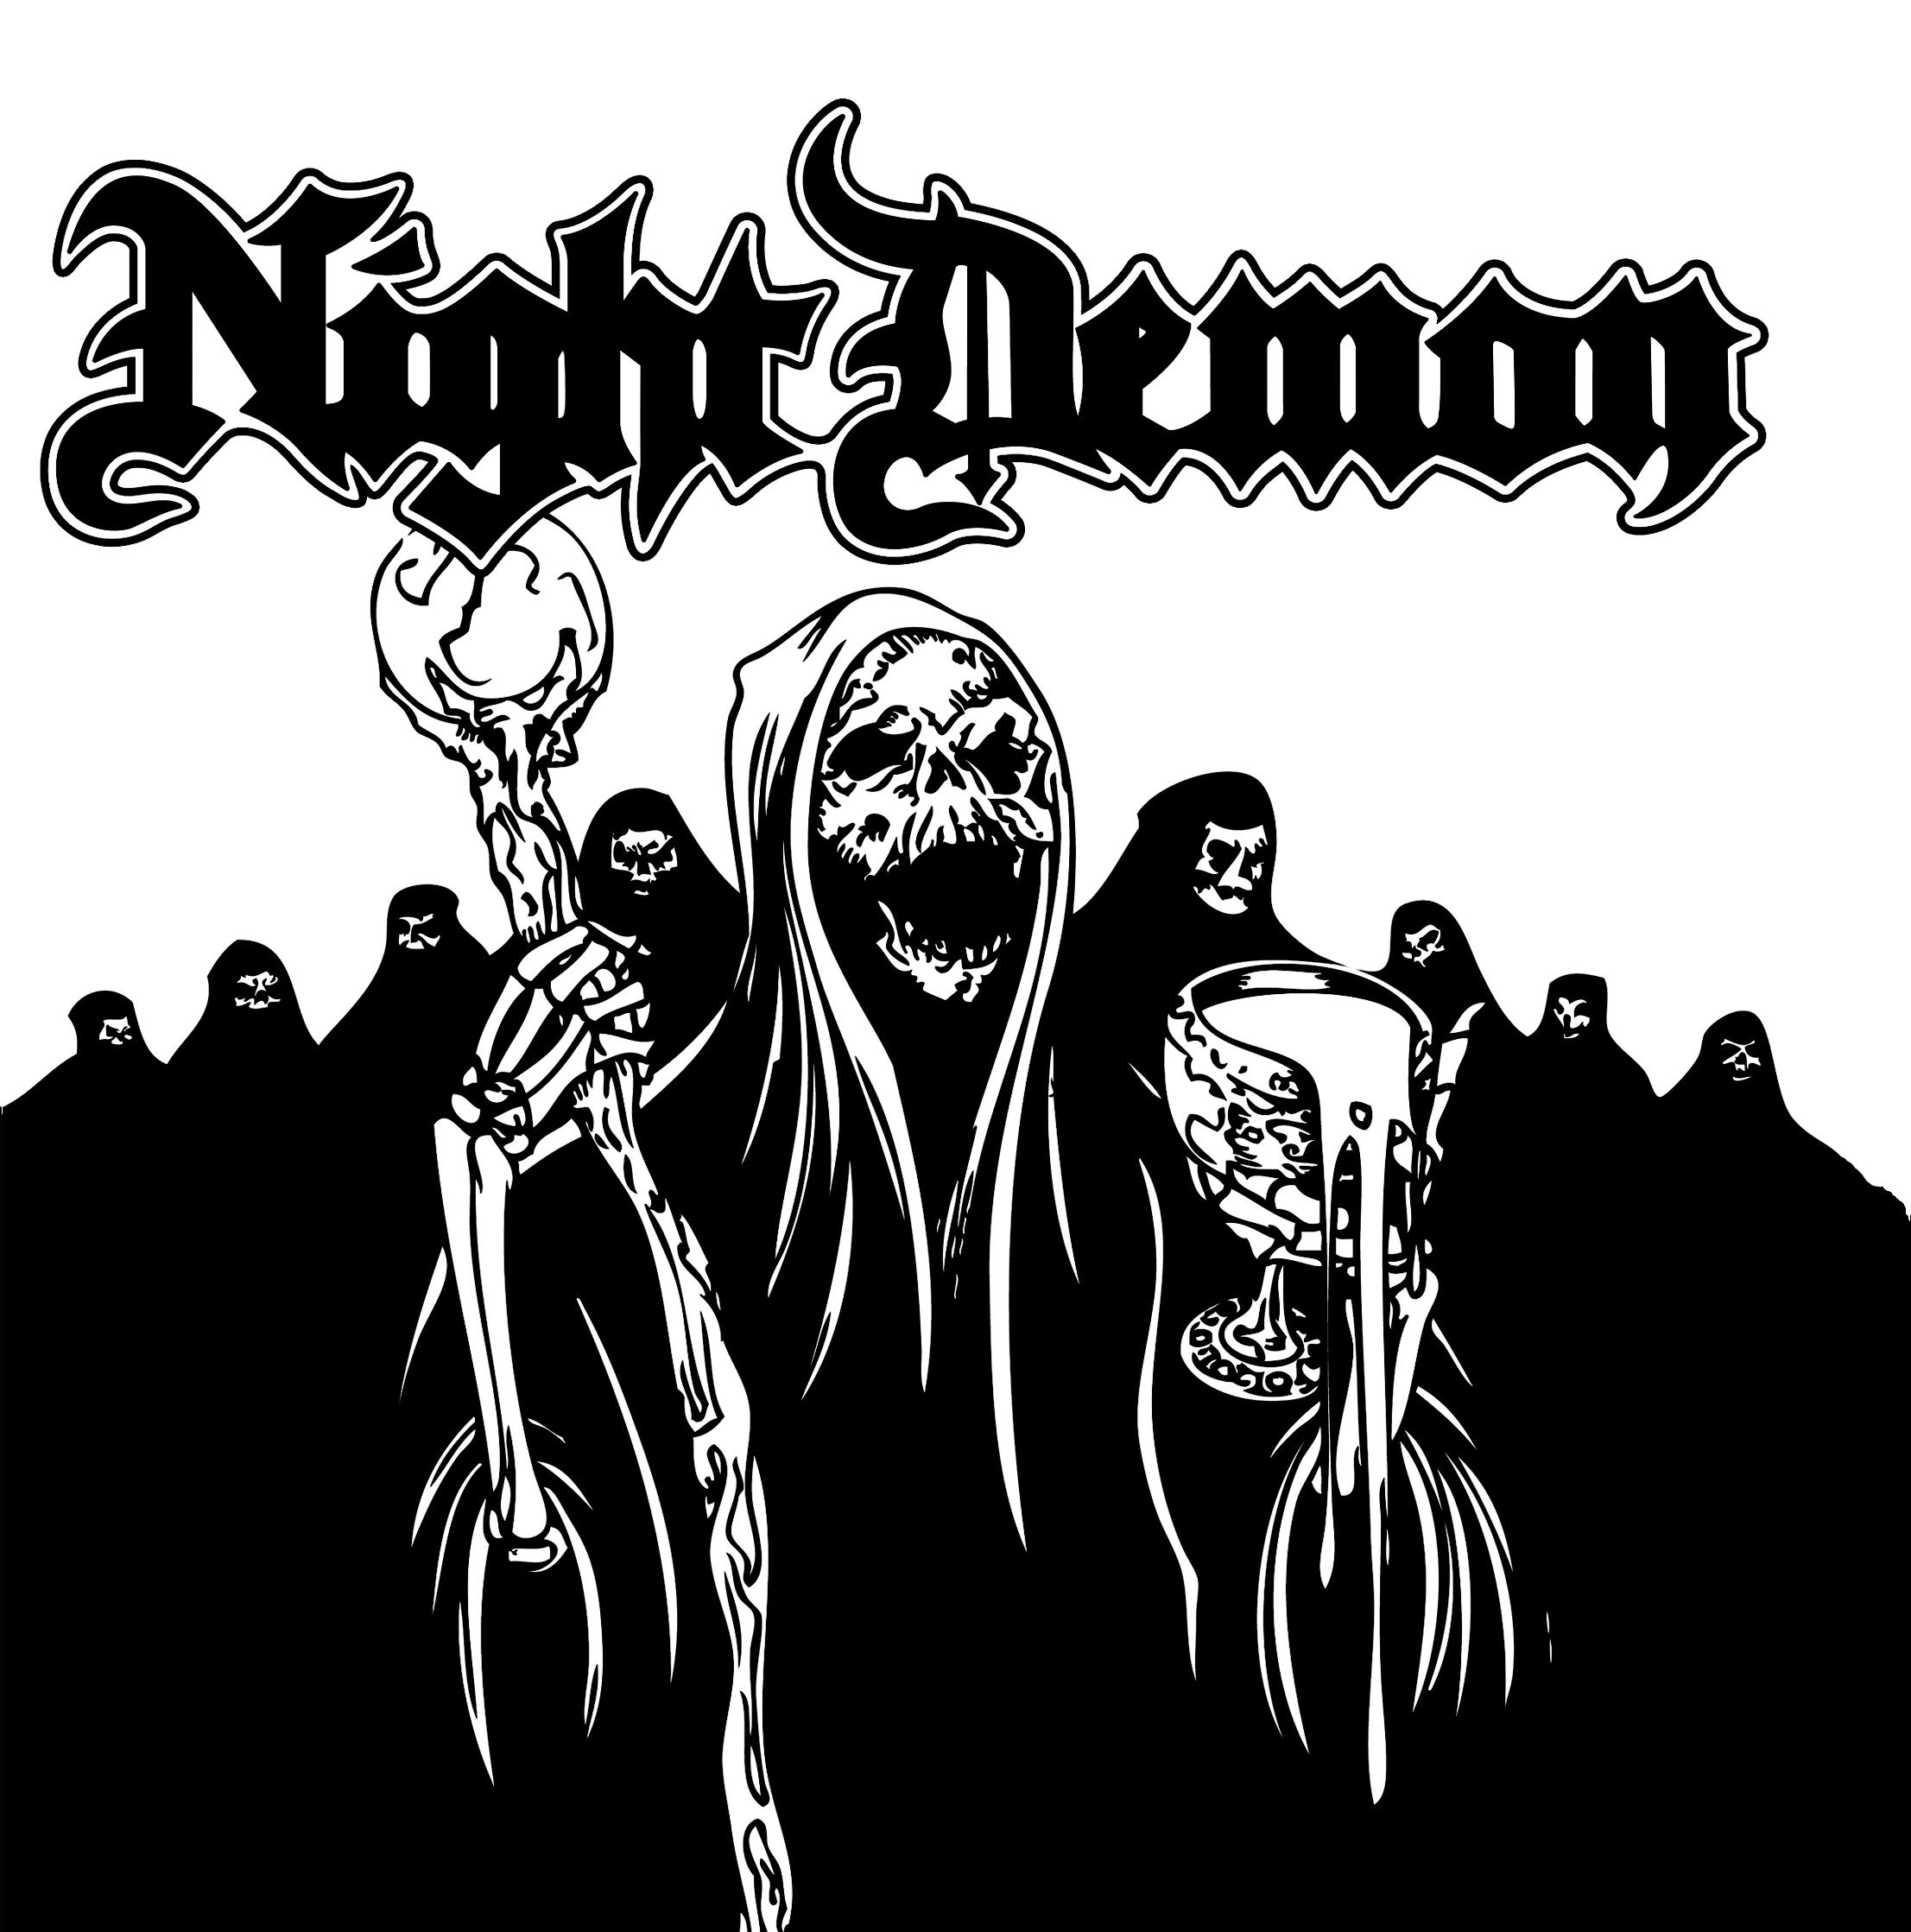 https://nightdemon.bandcamp.com/